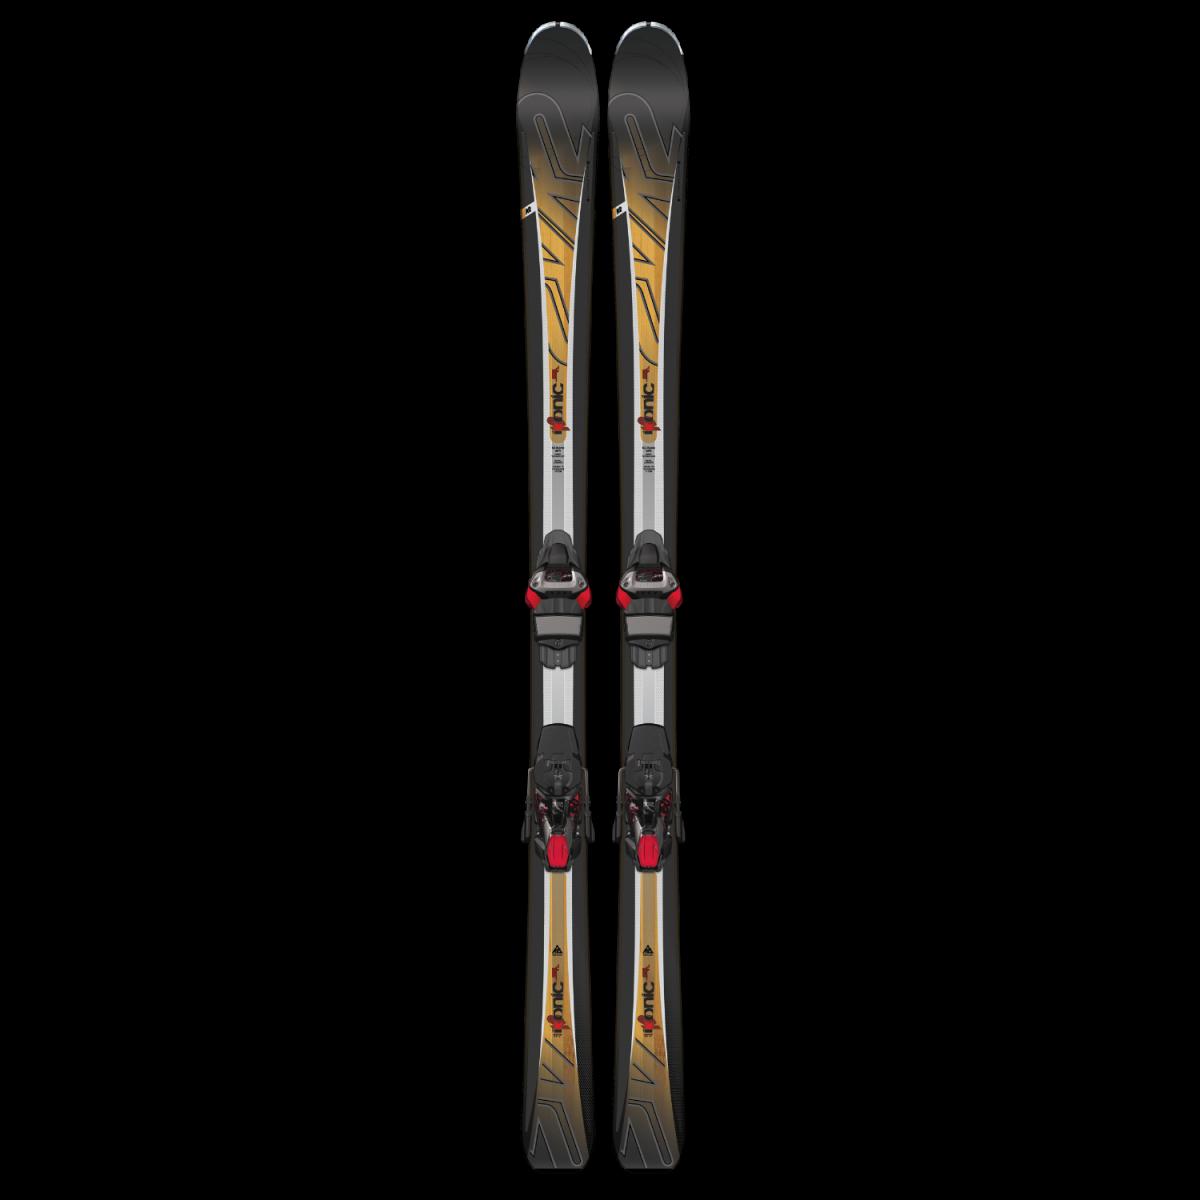 K2 Ikonic 85 Ti Skis With Mxc 12 Tcx 15 16 Golf Ski Warehouse Skiing Mens Skis K2 Skis